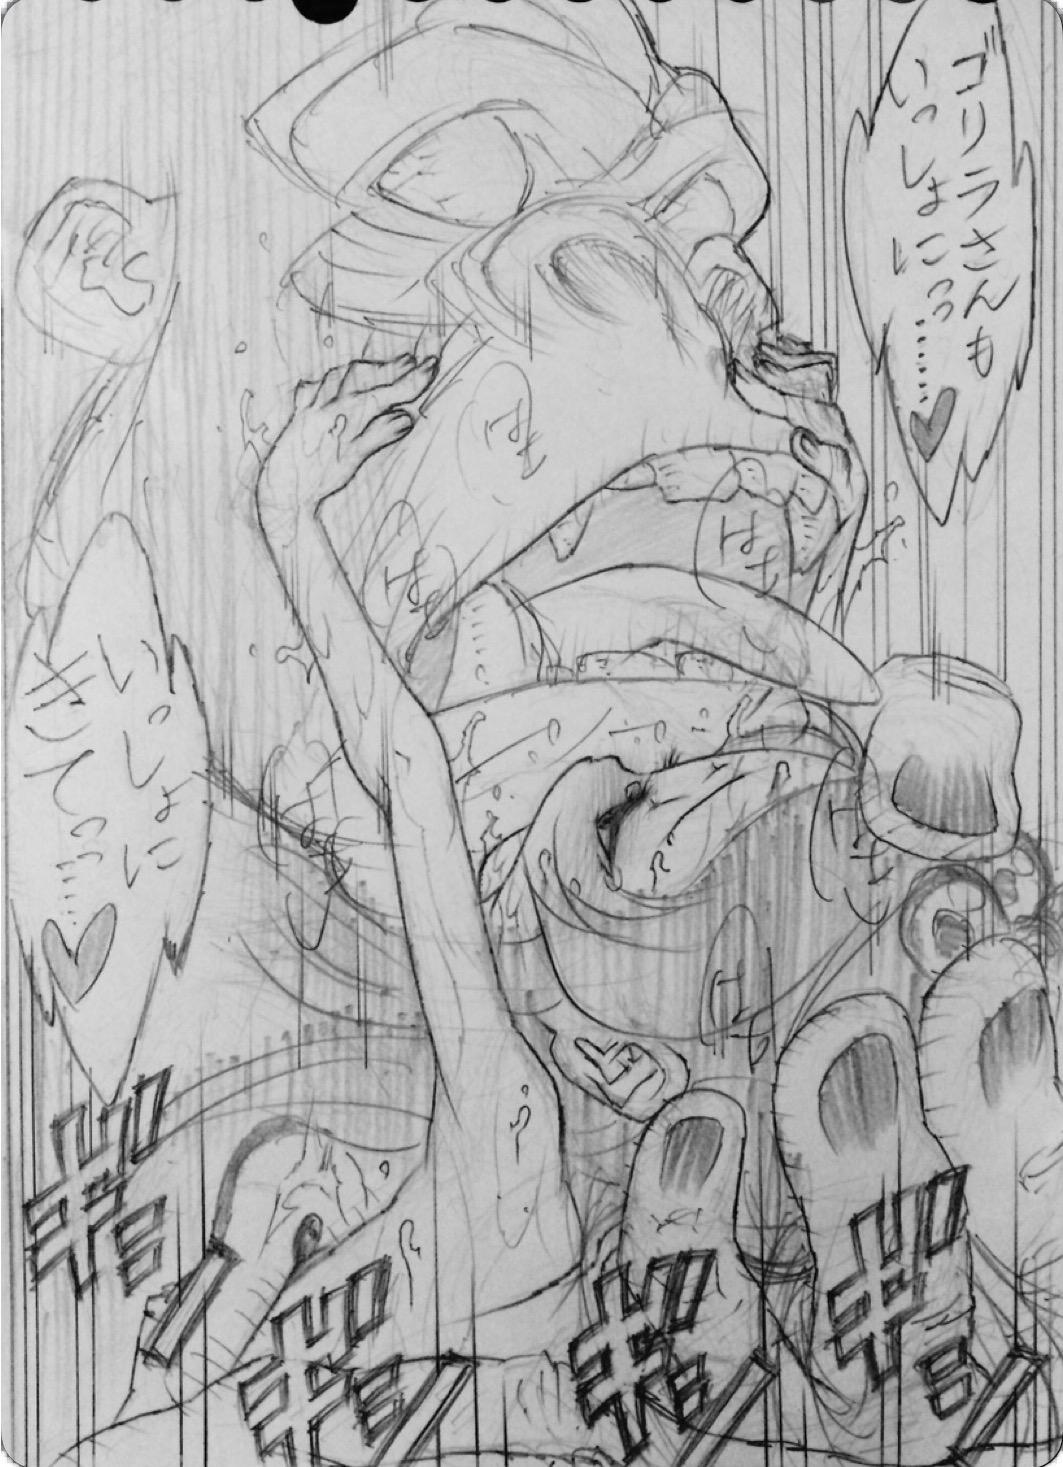 Gorilla-san and... 50